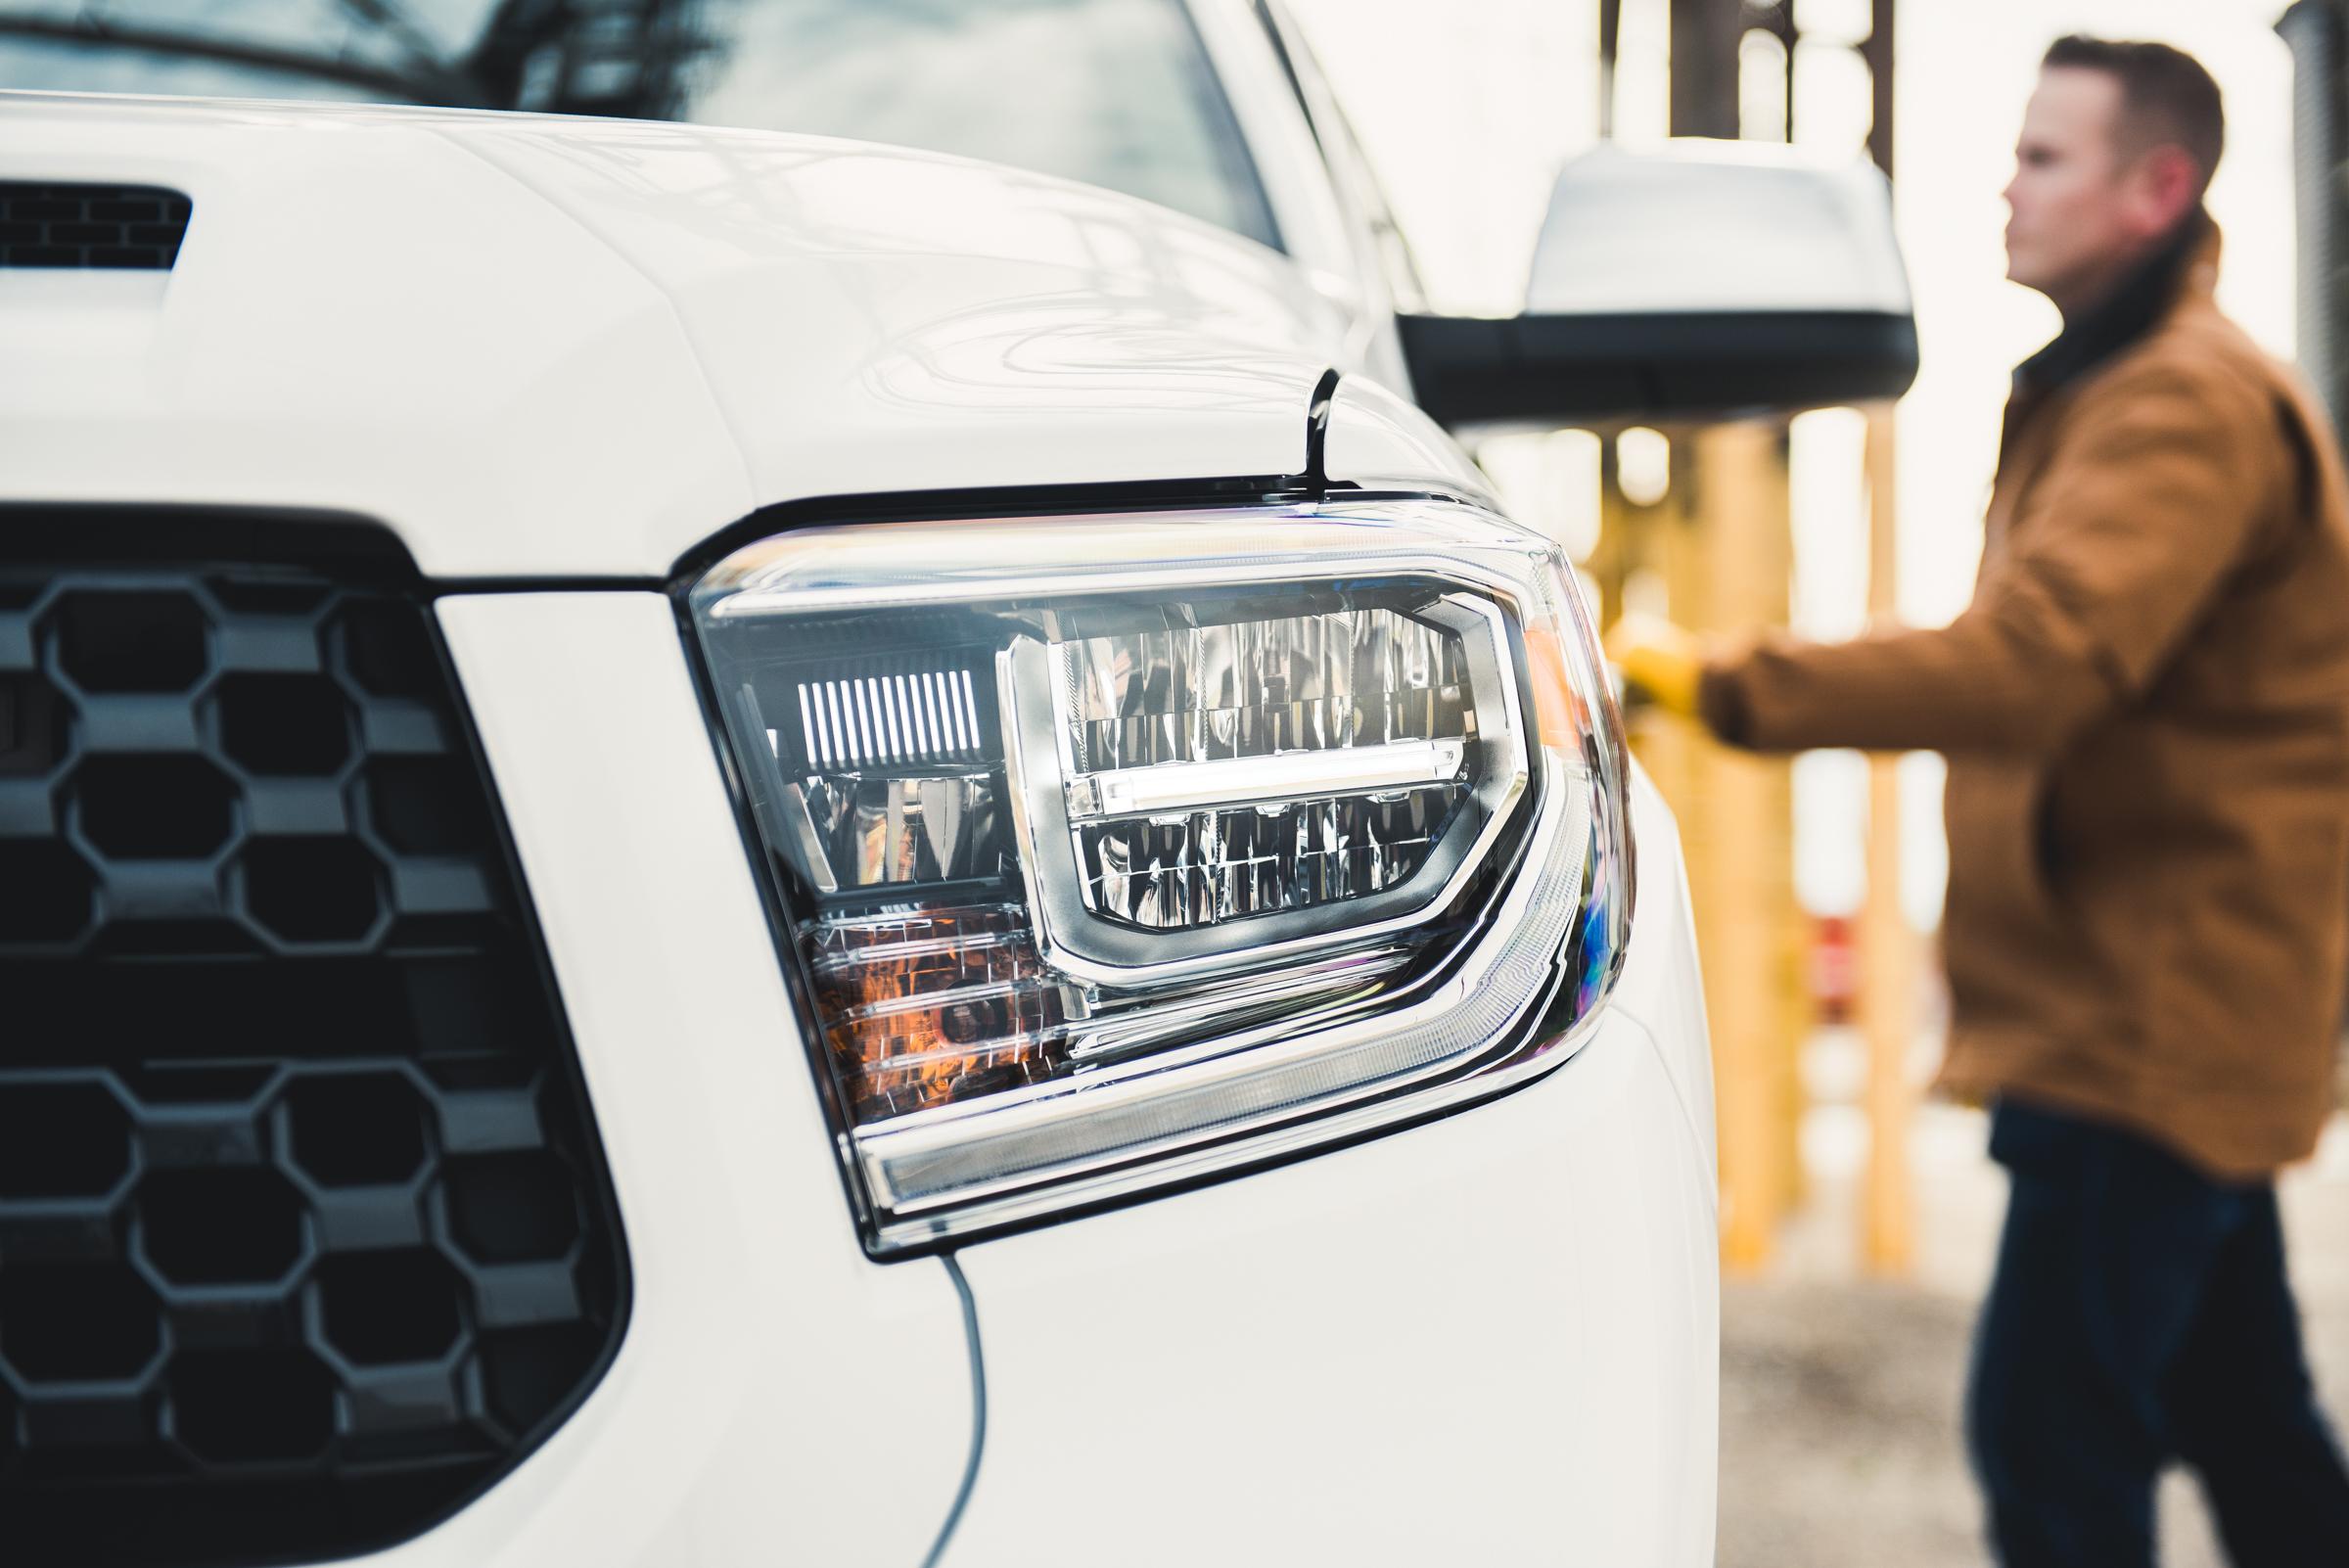 Toyota Texas Photo Shoot - Automotive Photography Los Angeles